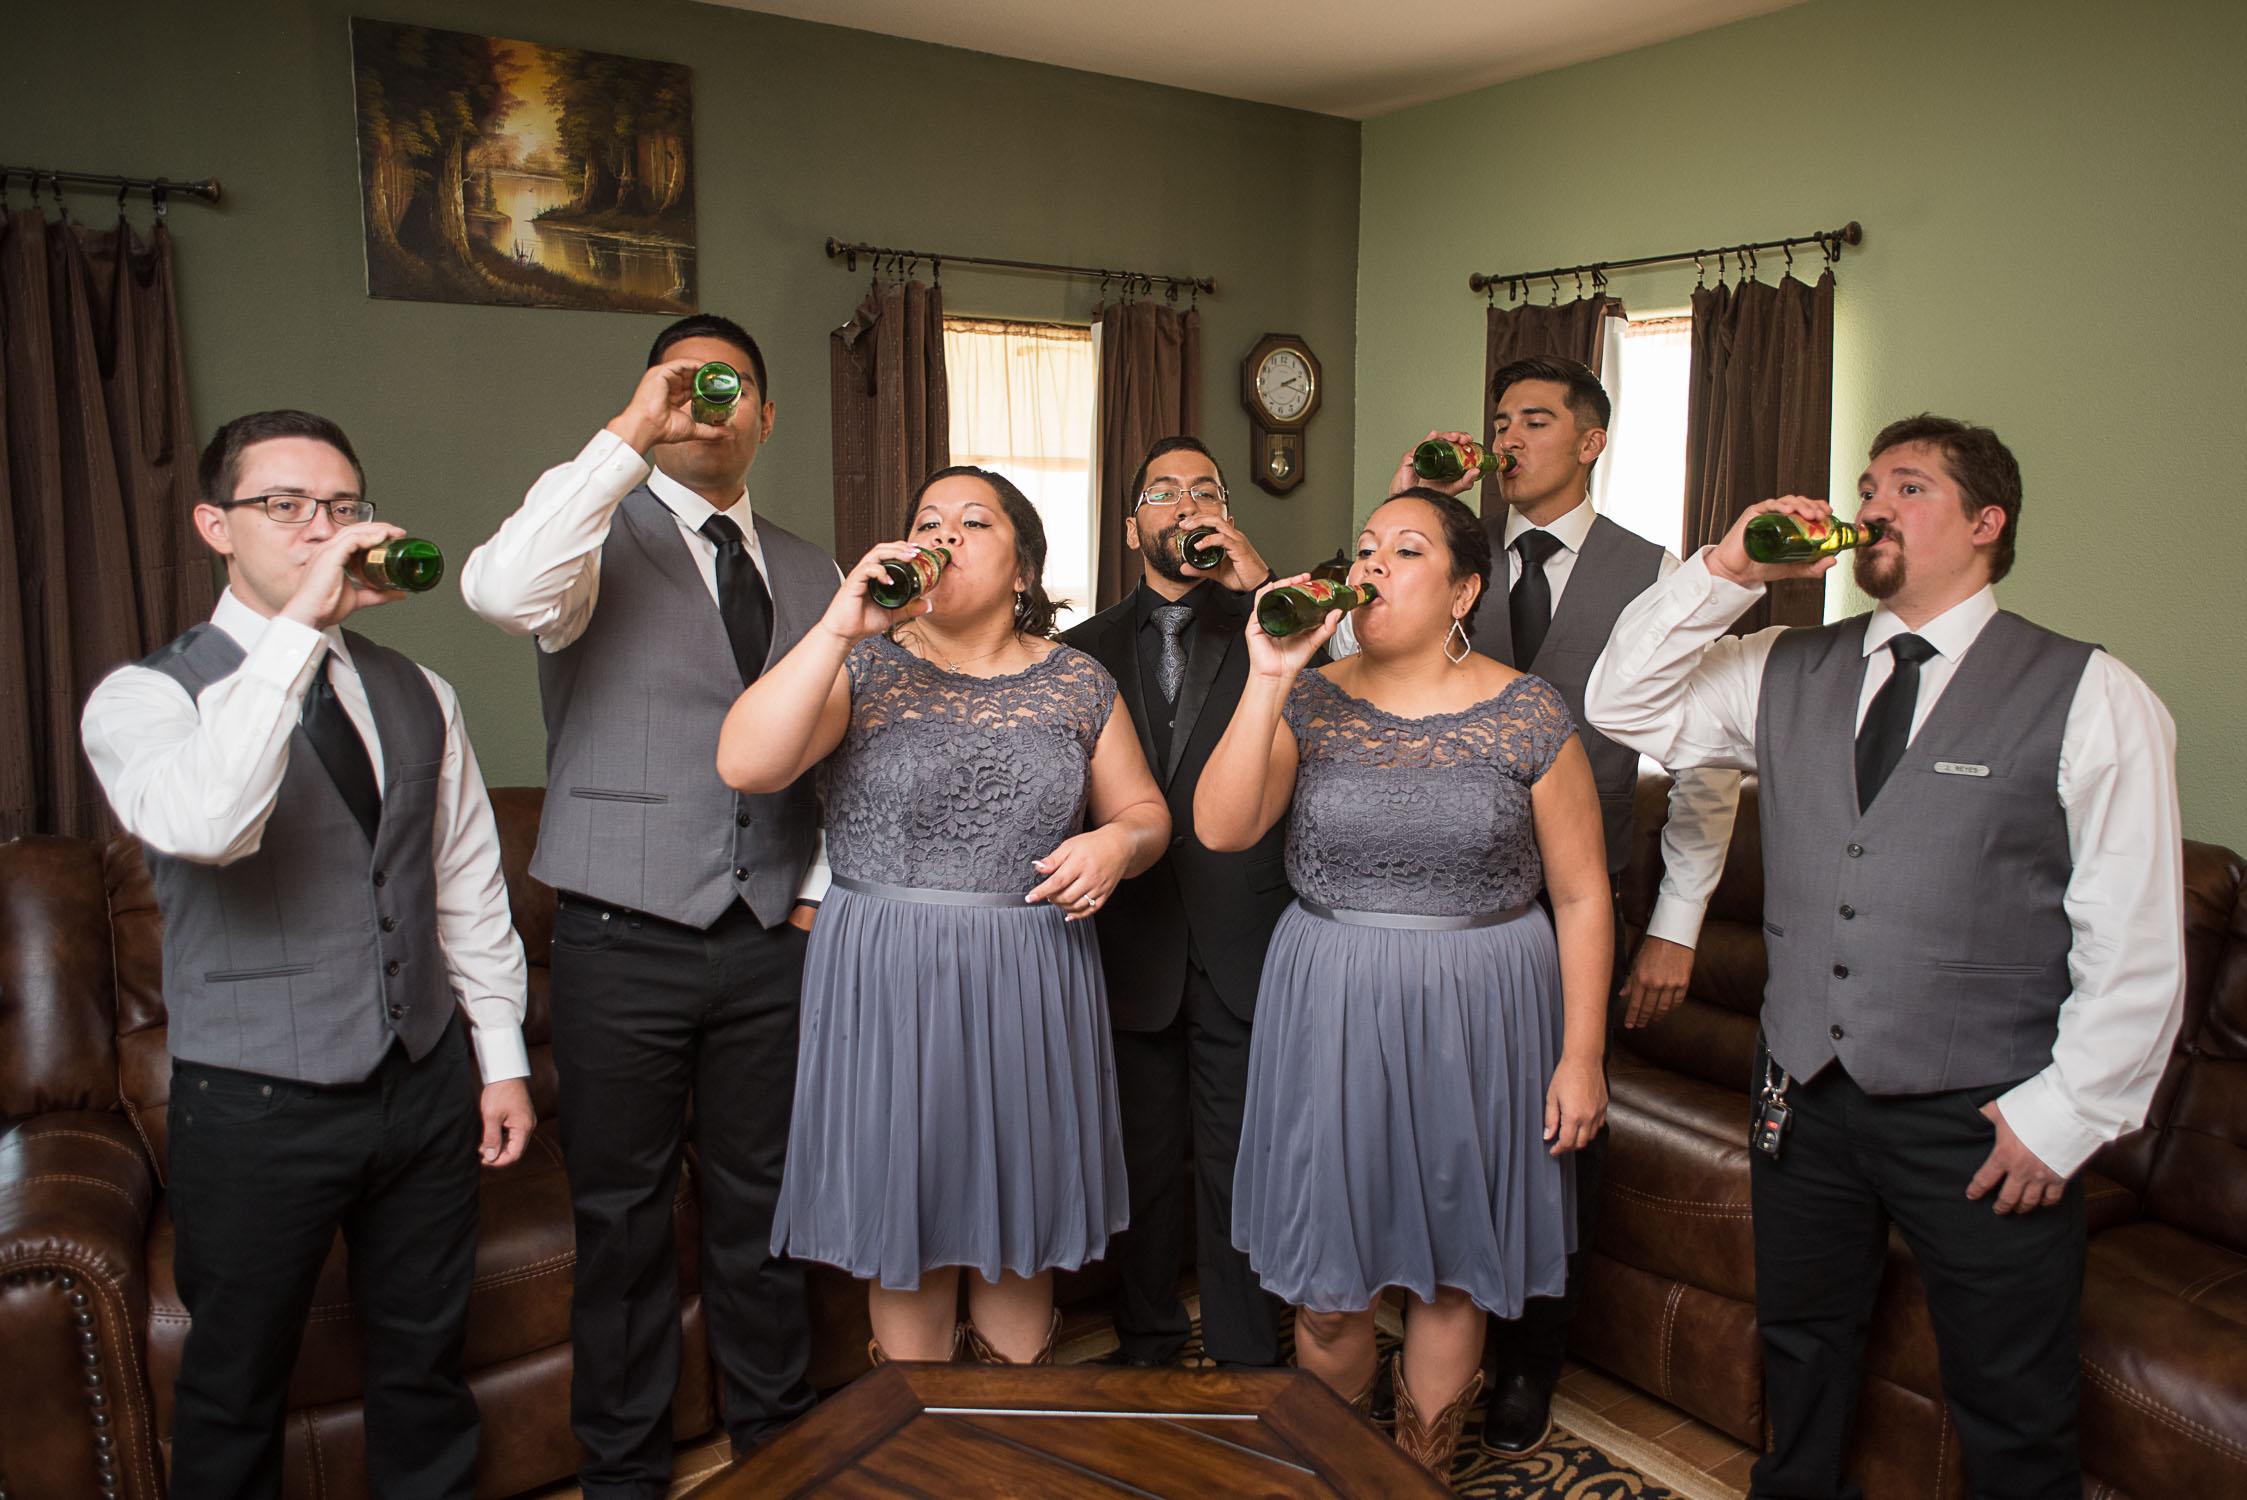 Leal Wedding Mira Visu Photography-45.jpg